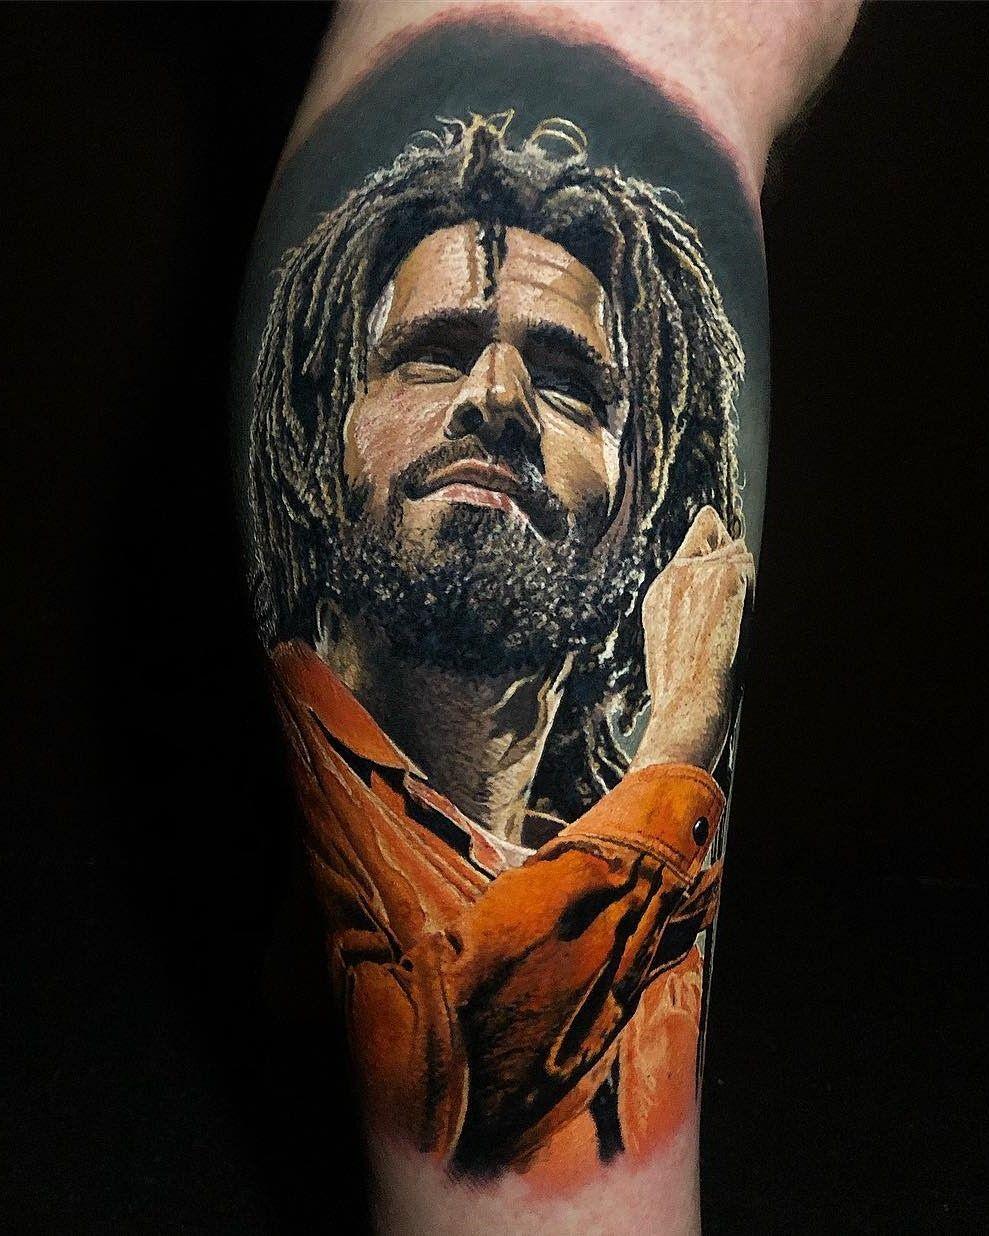 Pin by richard abq on reality tattoos j cole tattoos